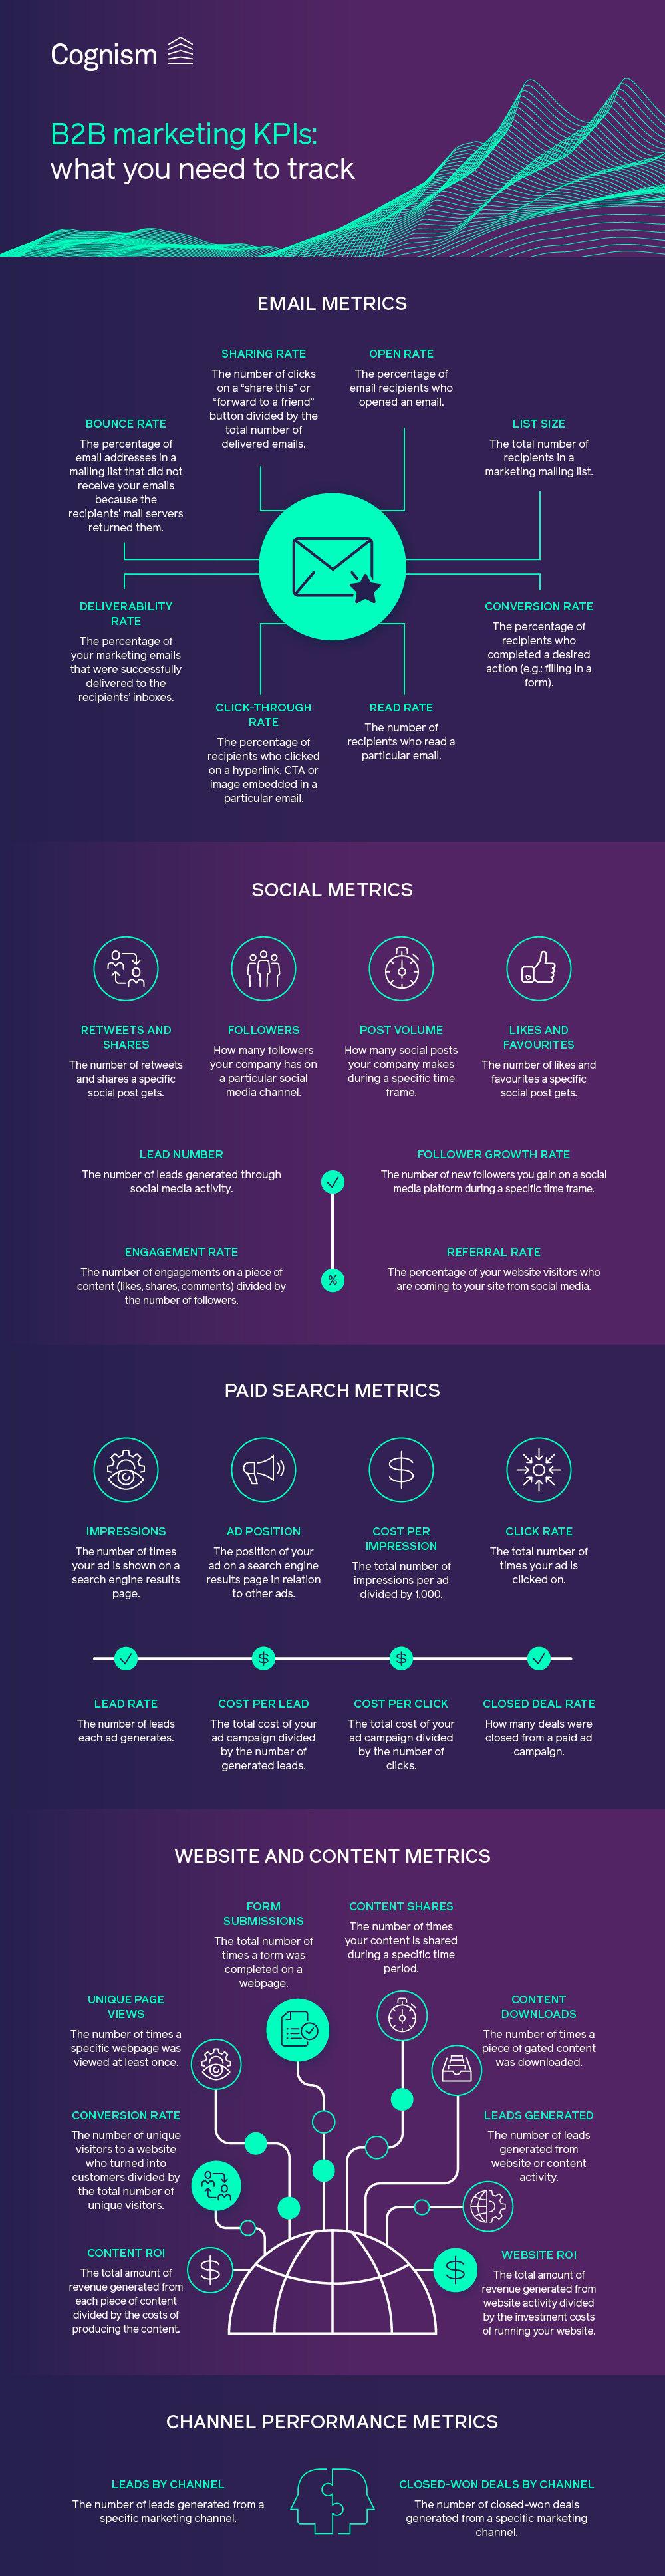 B2B marketing KPIs - what you need to track V1-01.jpg